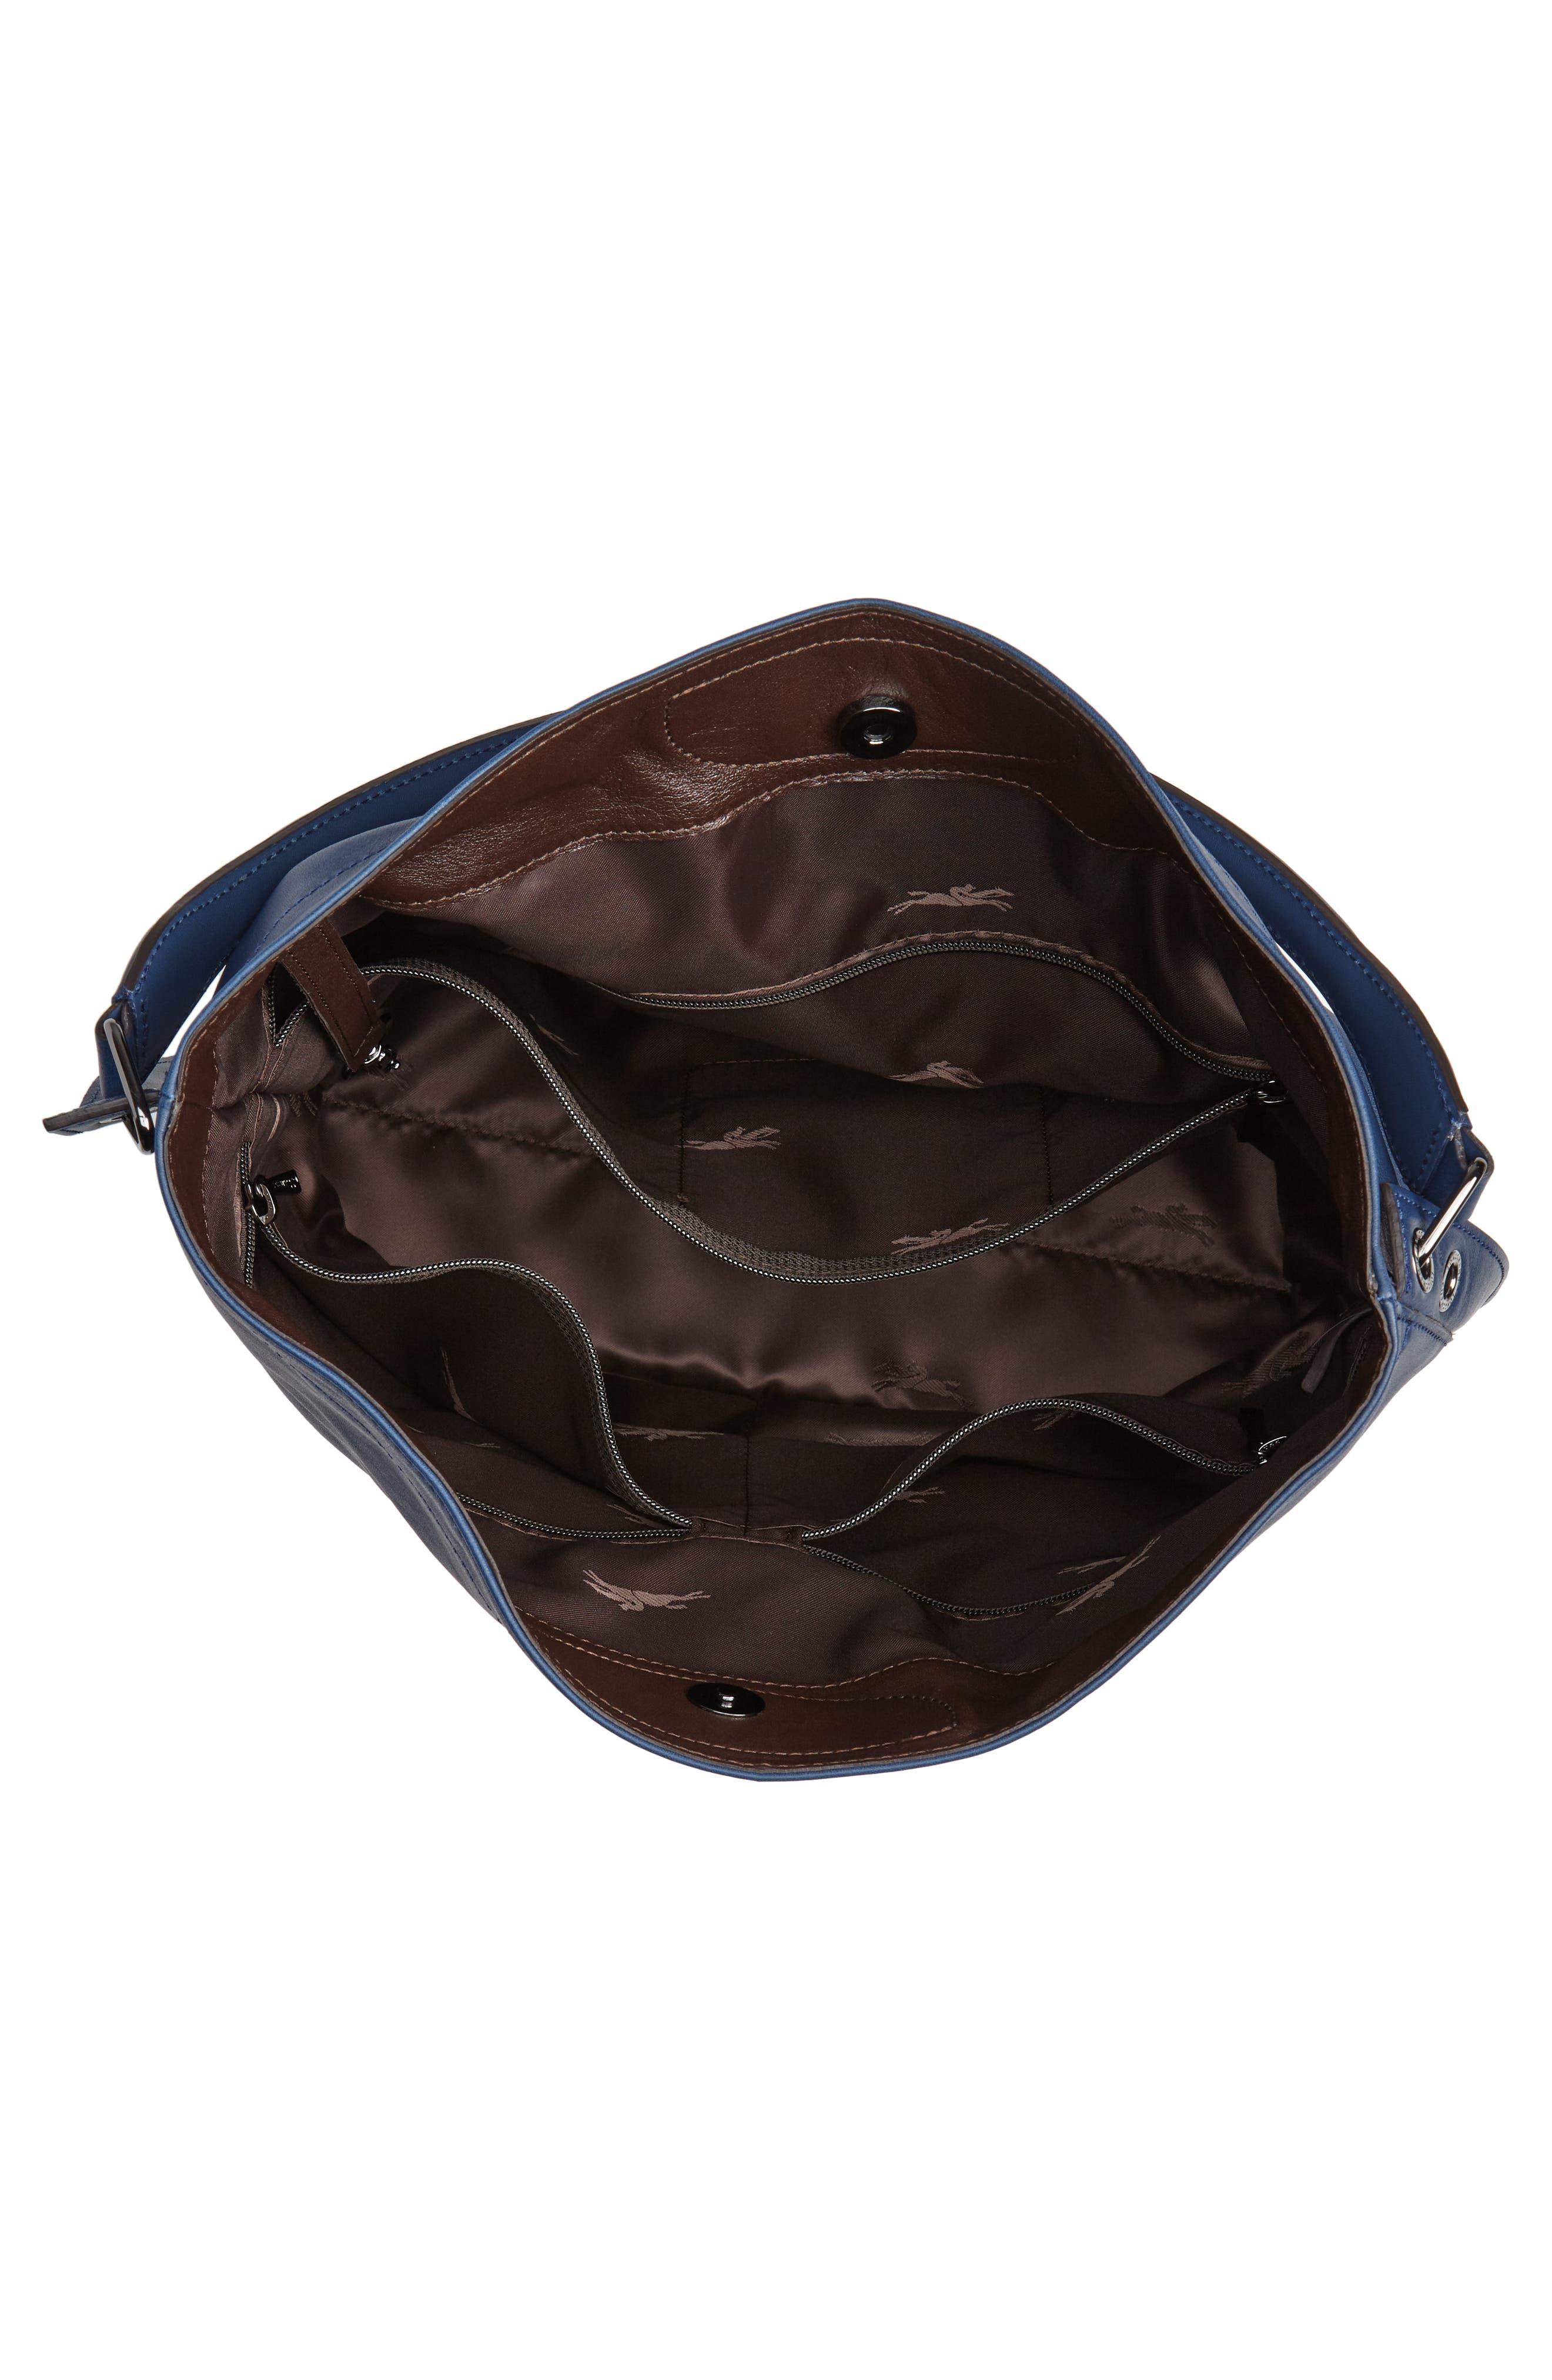 '3D' Leather Hobo,                             Alternate thumbnail 4, color,                             PILOT BLUE